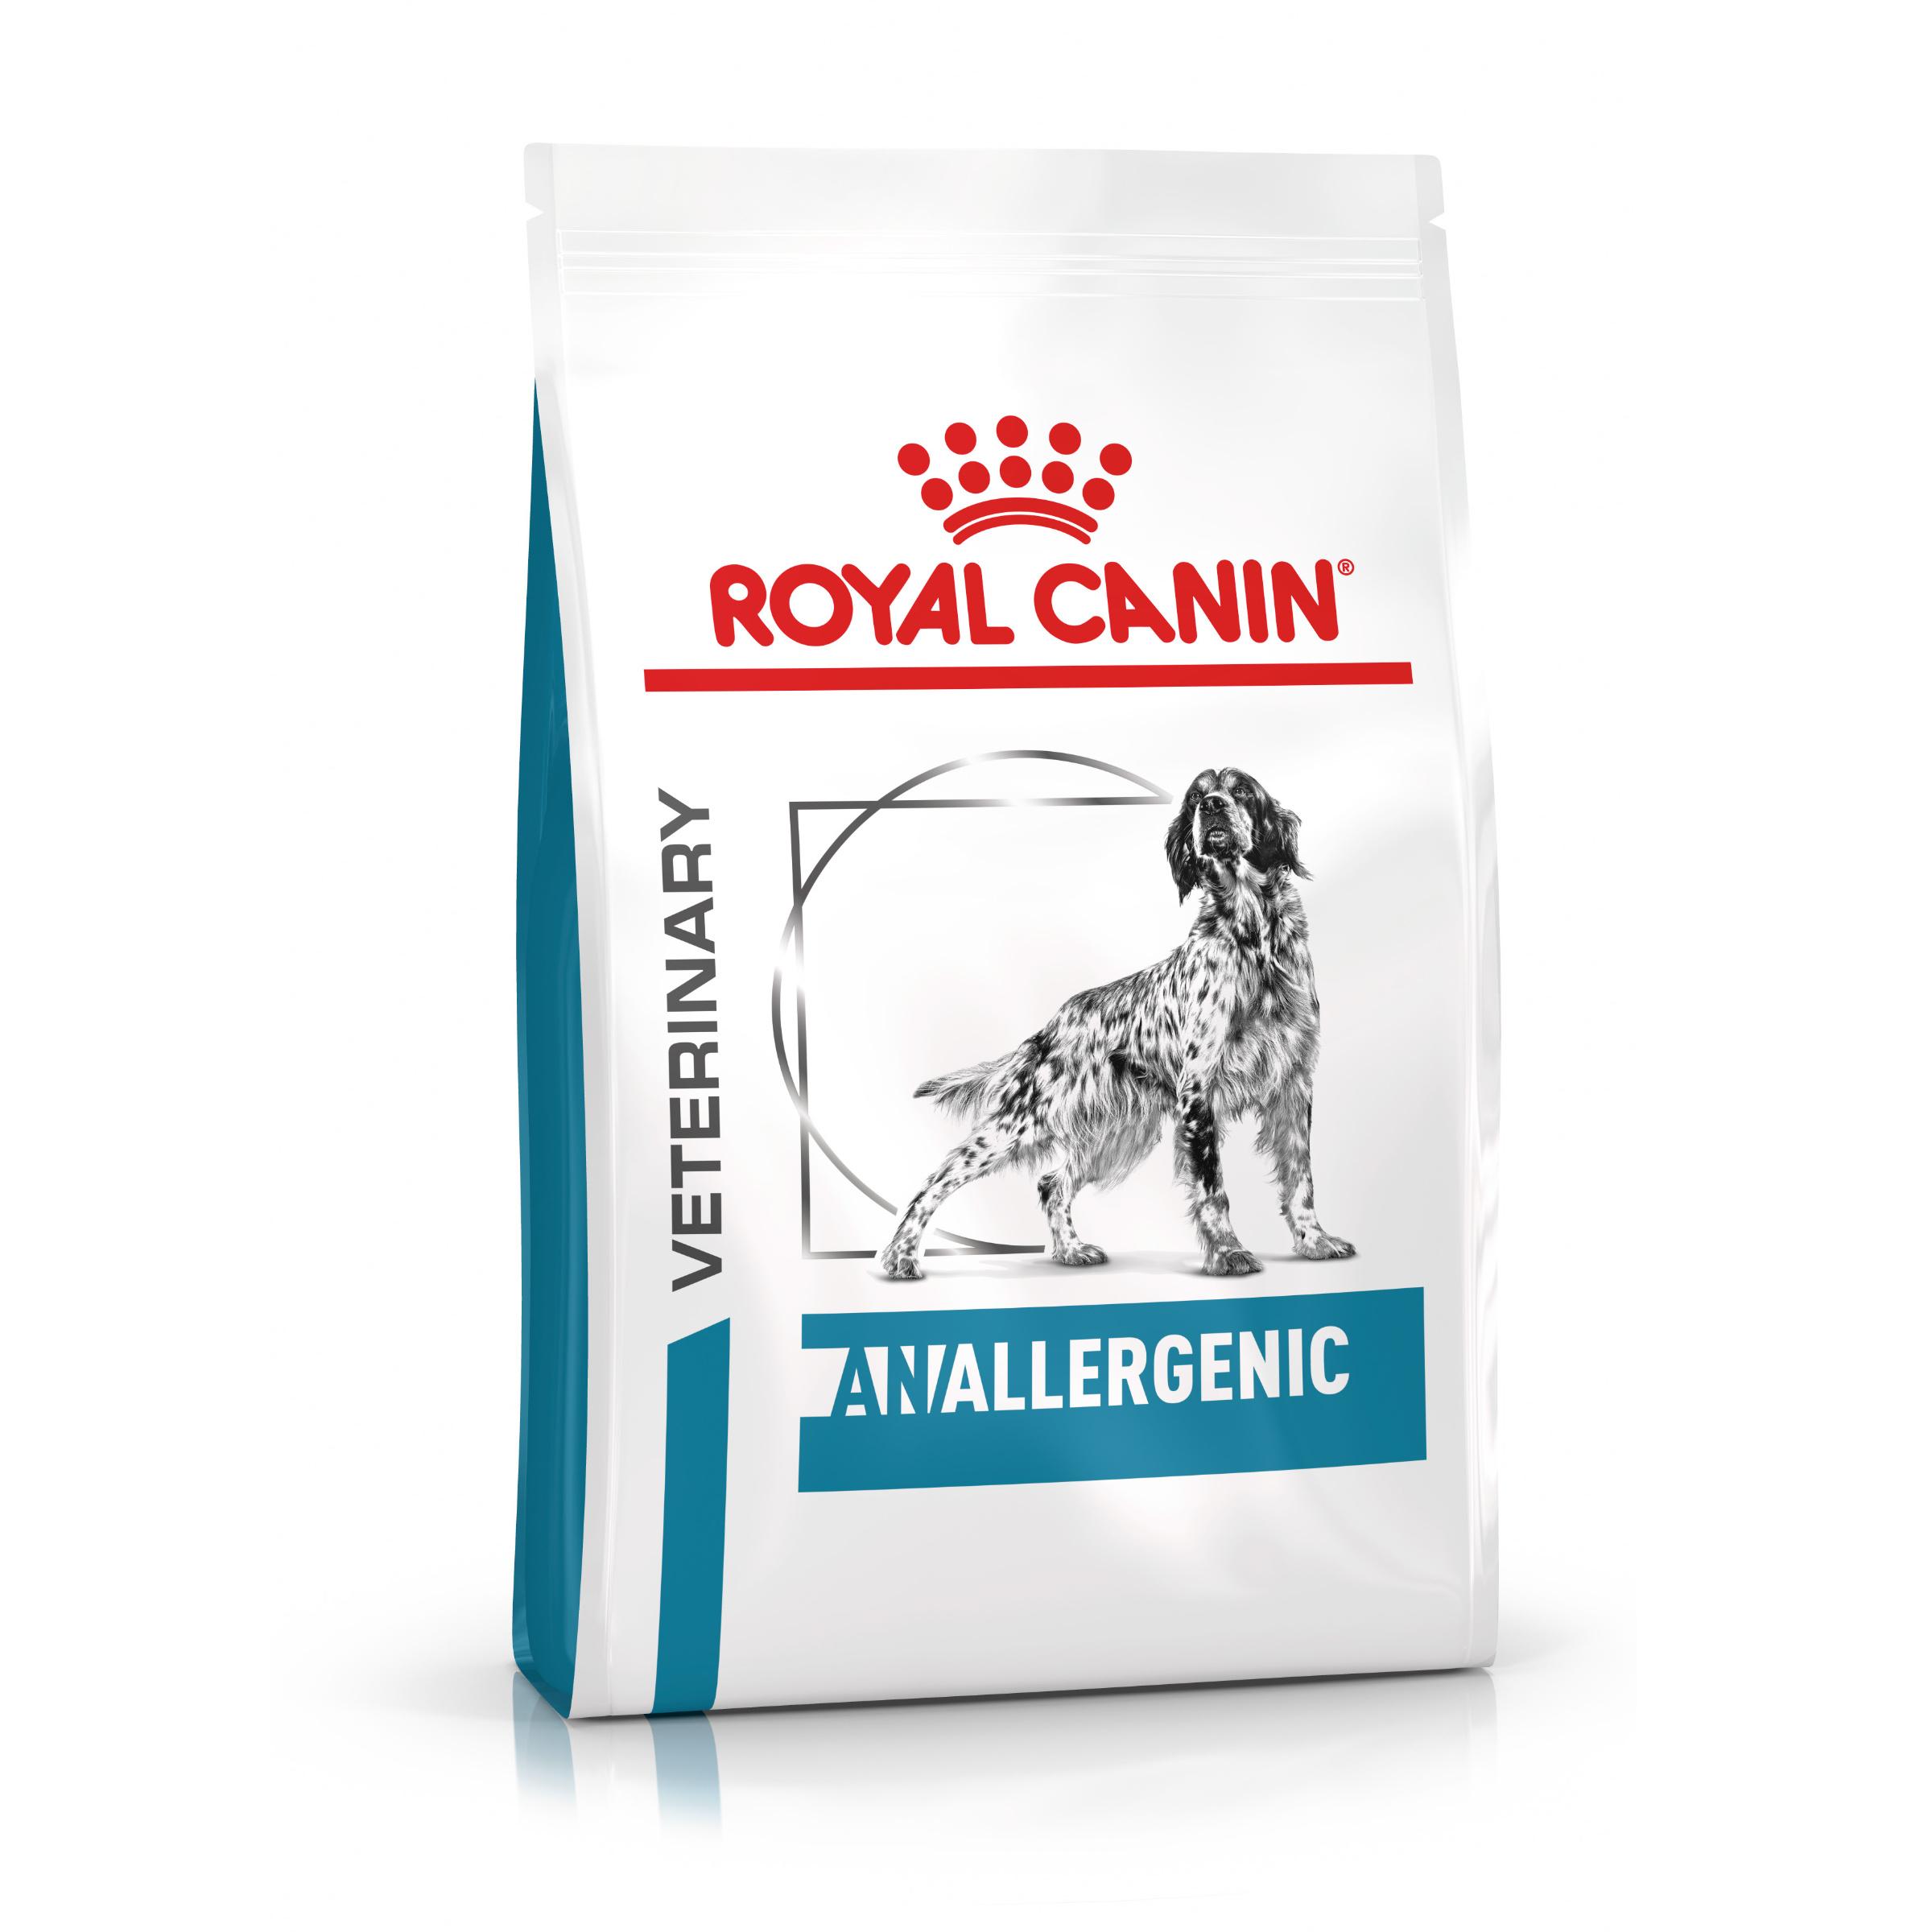 Royal Canin Veterinary Health Nutrition Dog ANALLERGENIC - 3kg